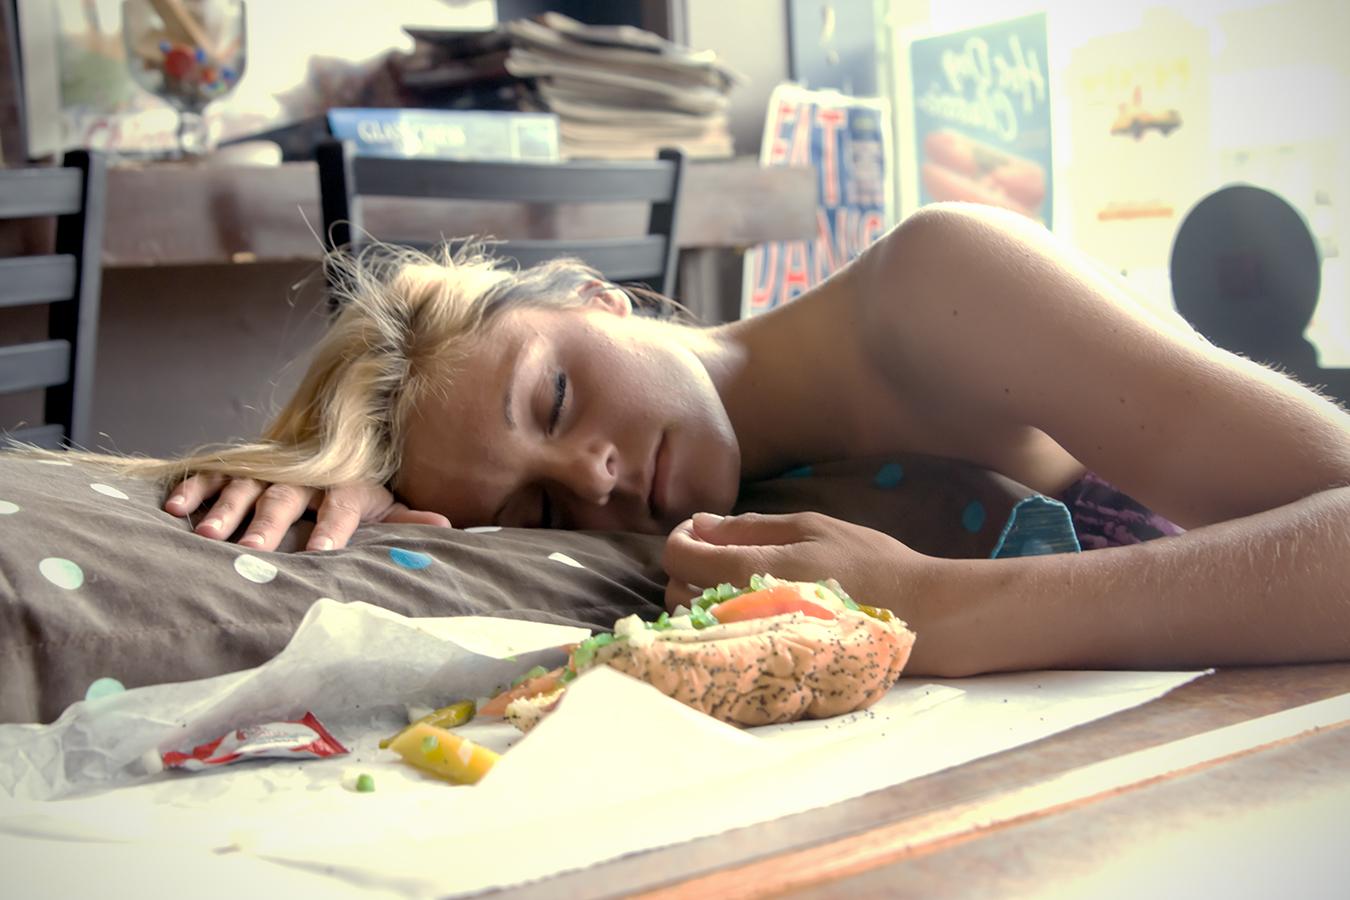 charles i. letbetter - sleeping through sunday